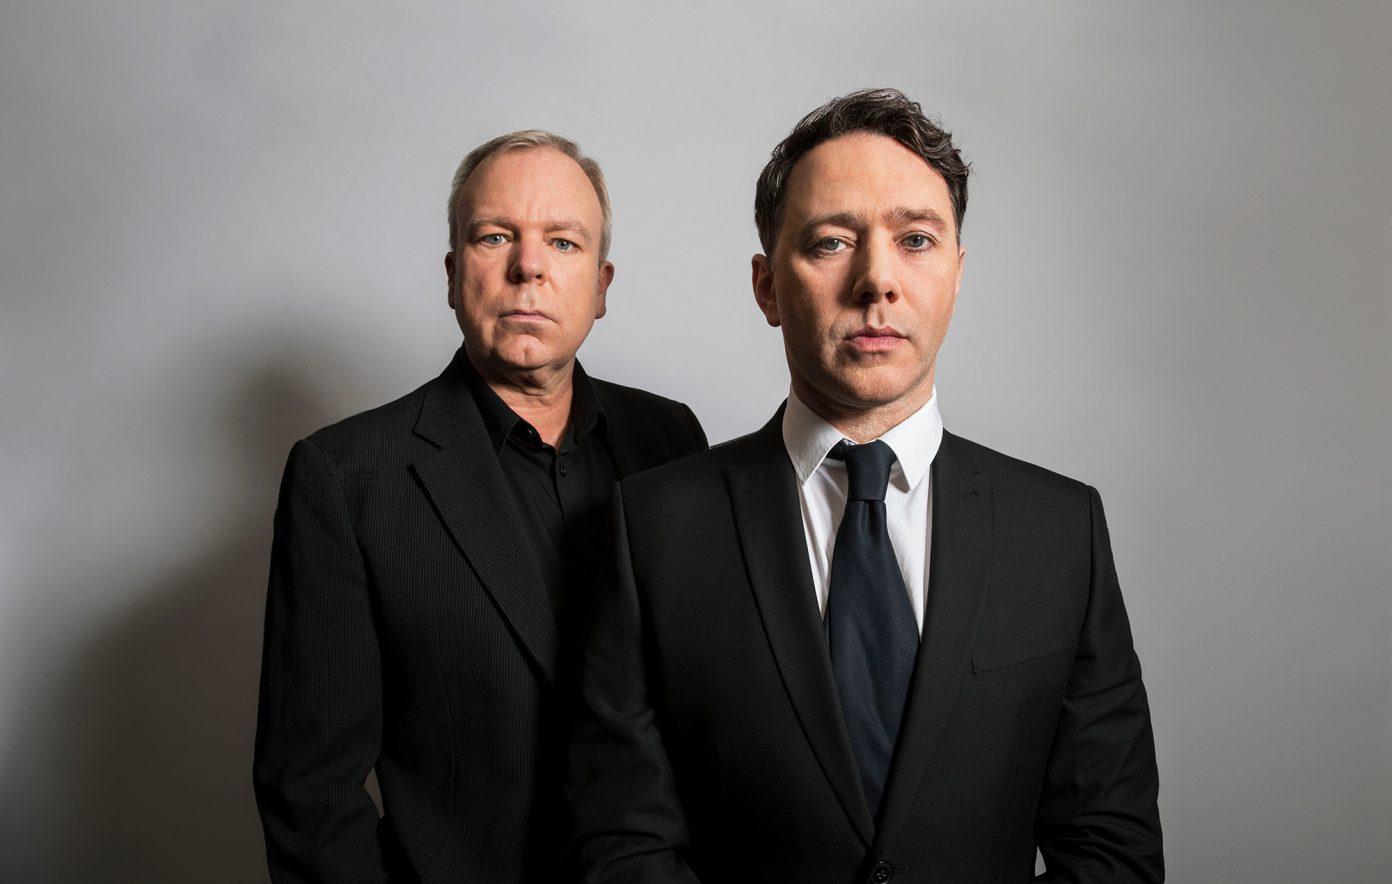 Inside No. 9: Ο Steve Pemberton και ο Reece Shearsmith. Credit: BBC